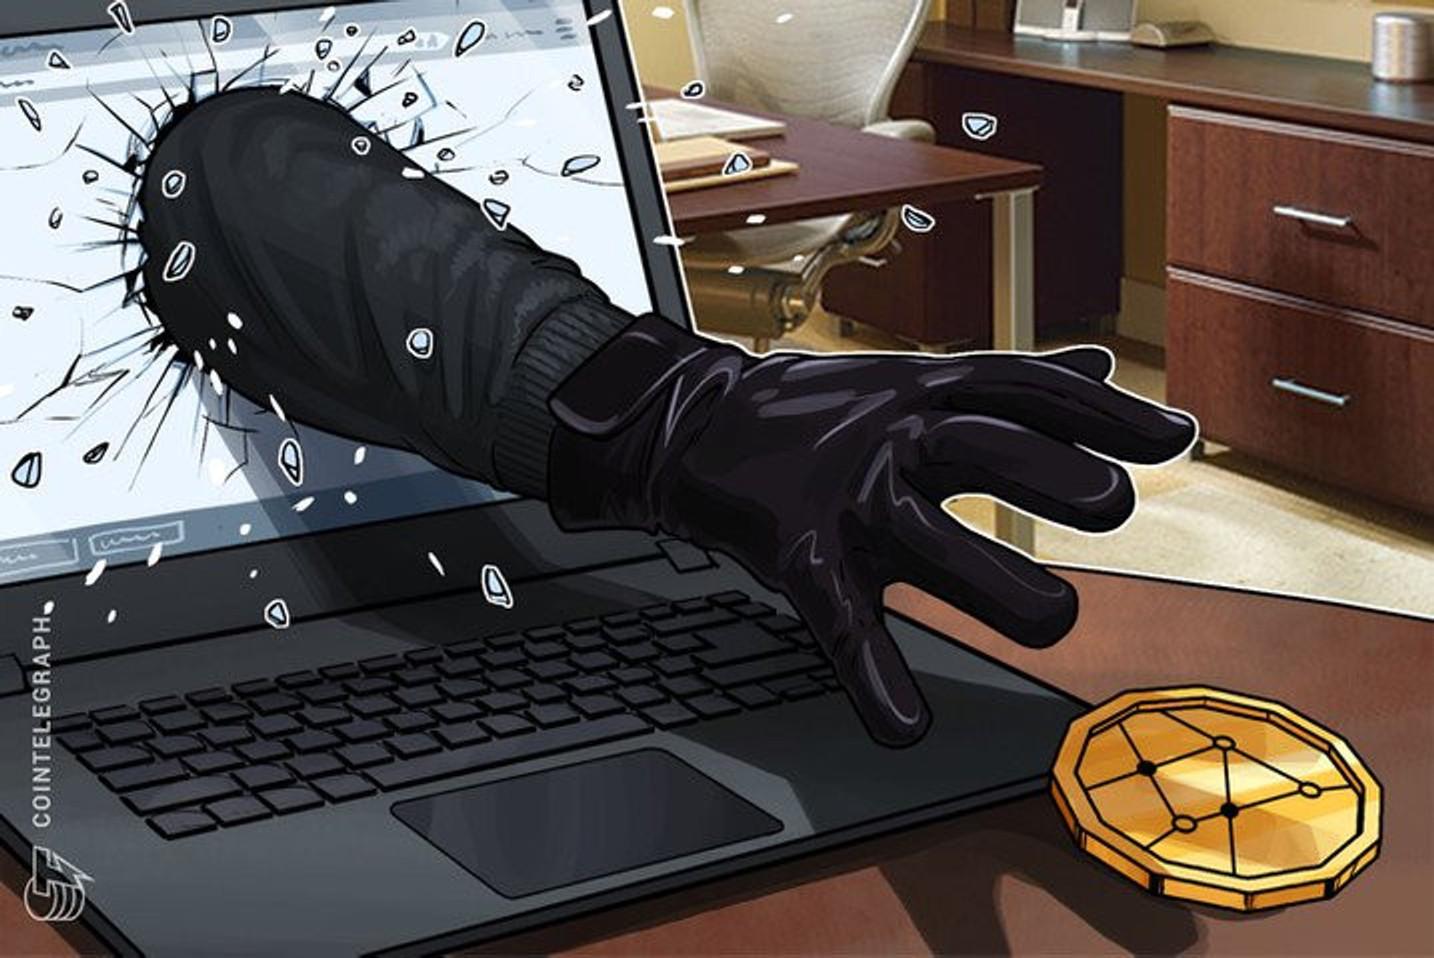 Hackers miram em programadores para roubar criptomoedas